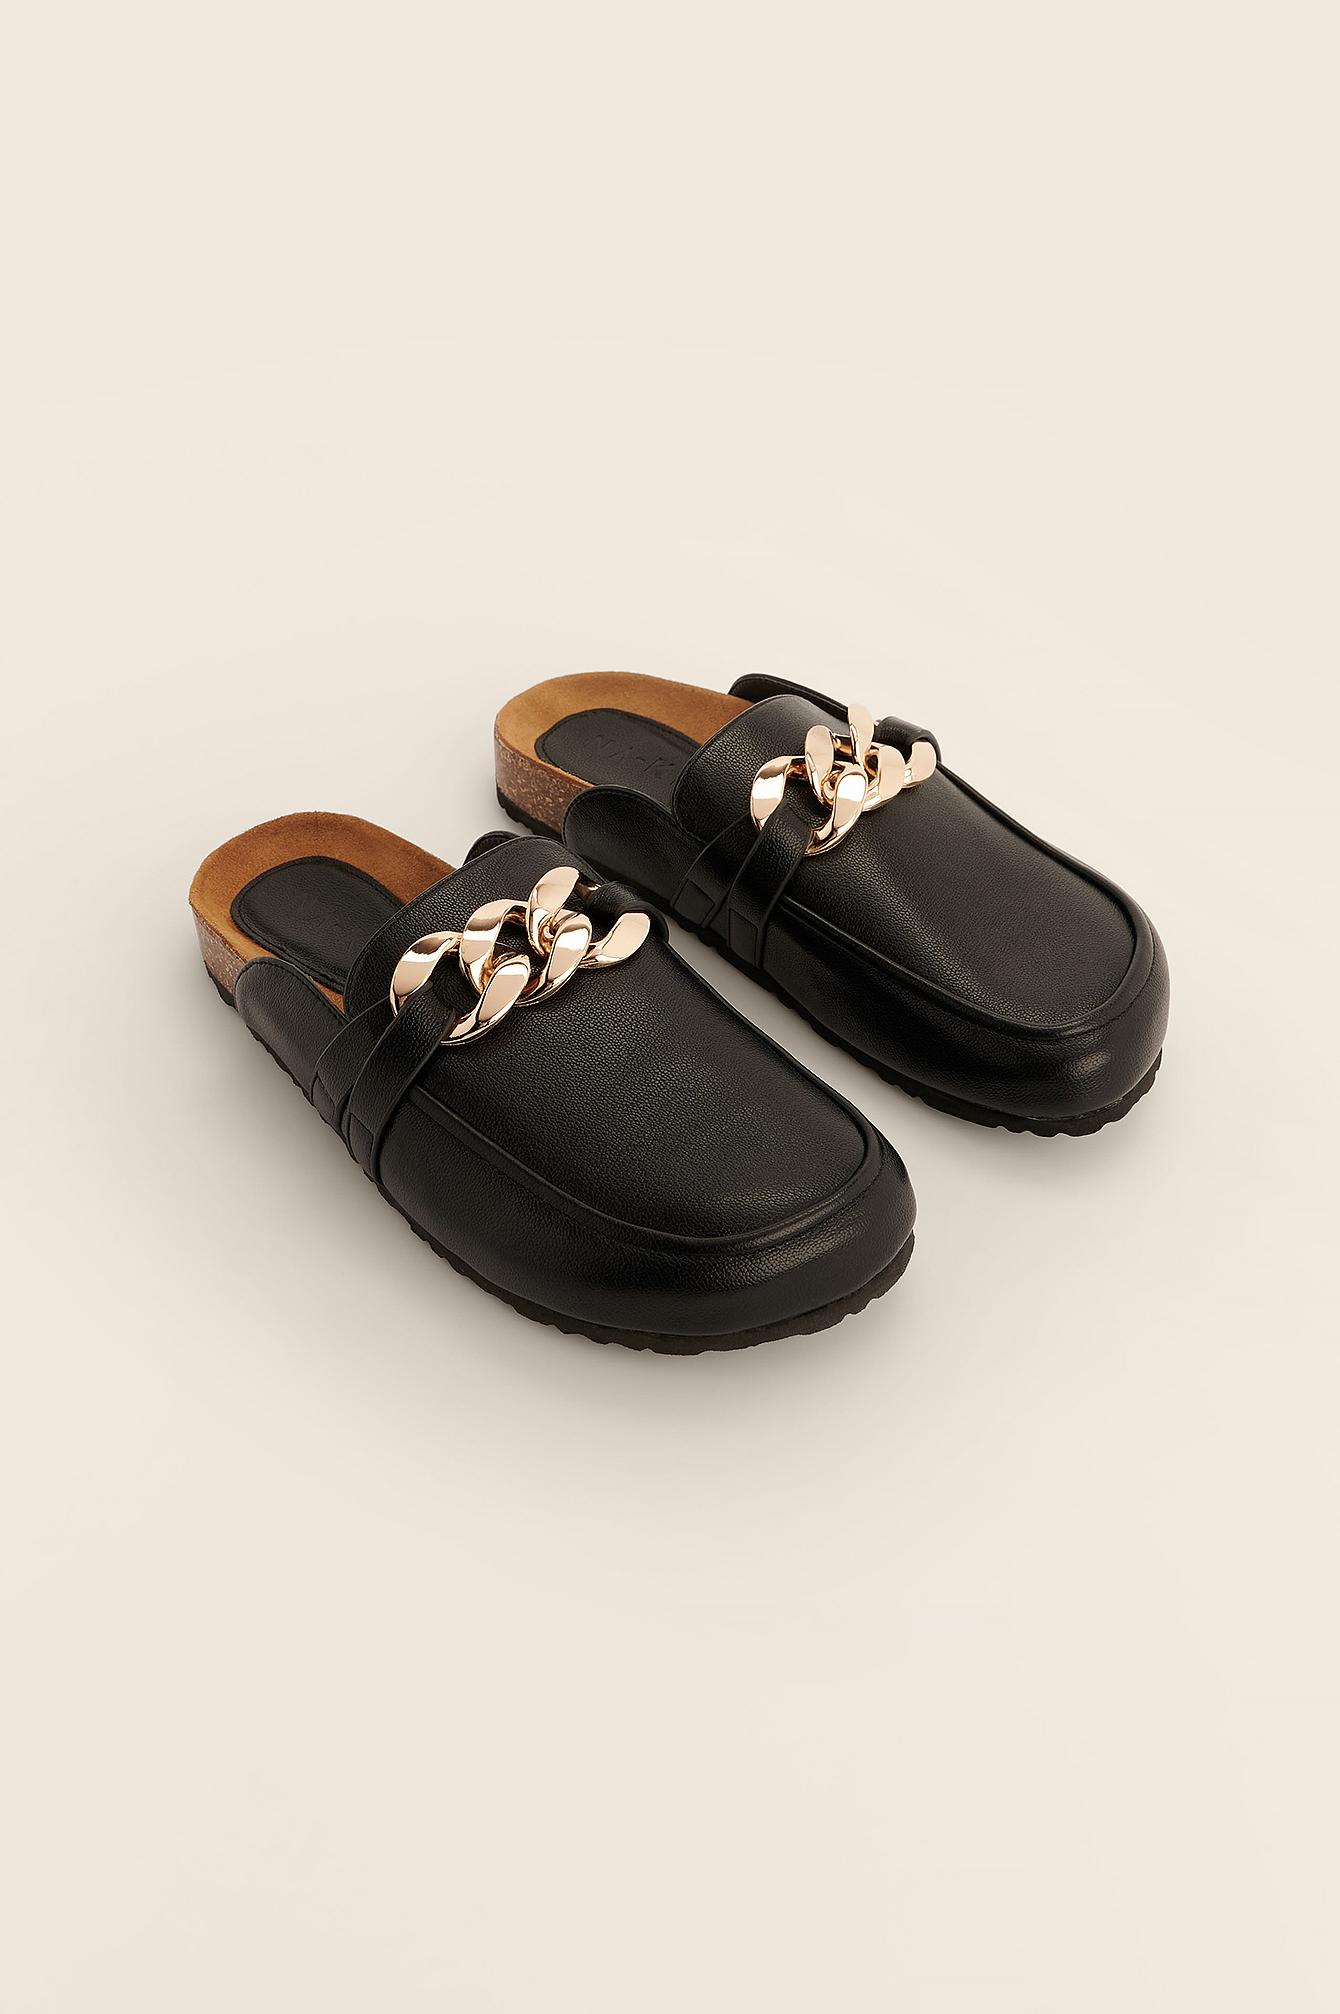 na-kd shoes -  Halbschuhe Mit Ketten-Details - Black